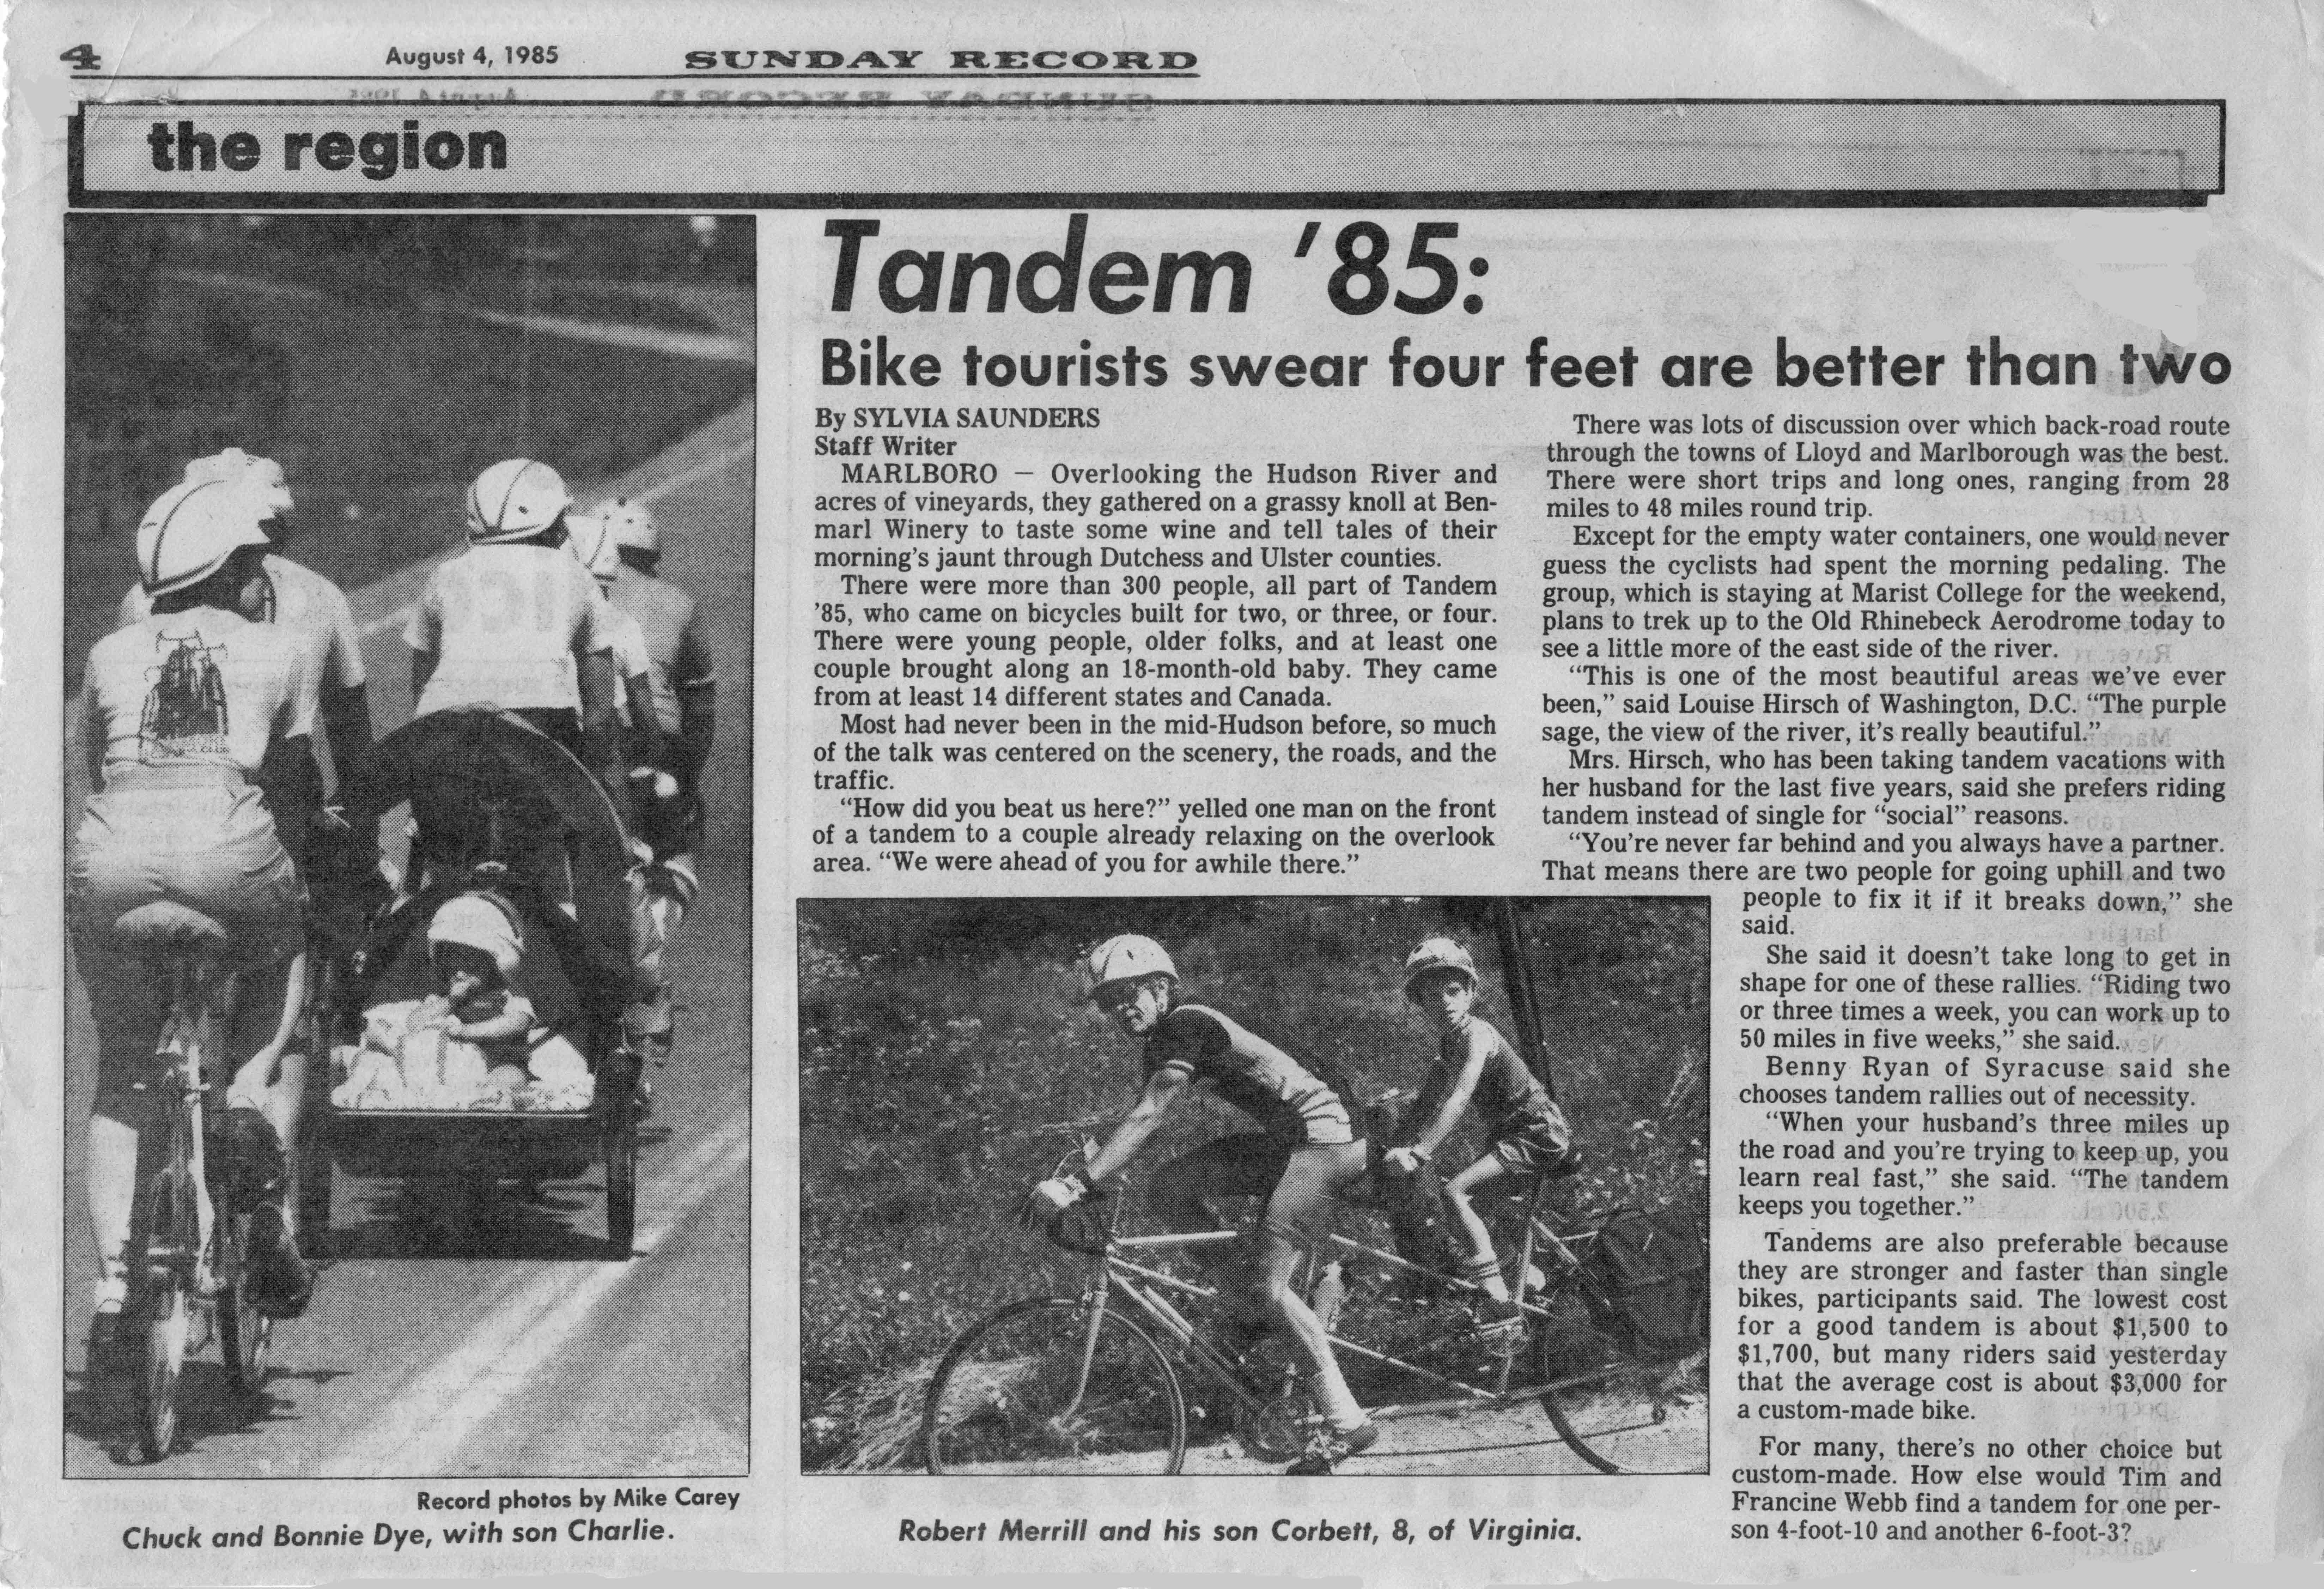 Marlborough Sunday Record, August 4, 1985 - Coverage of ETR '85